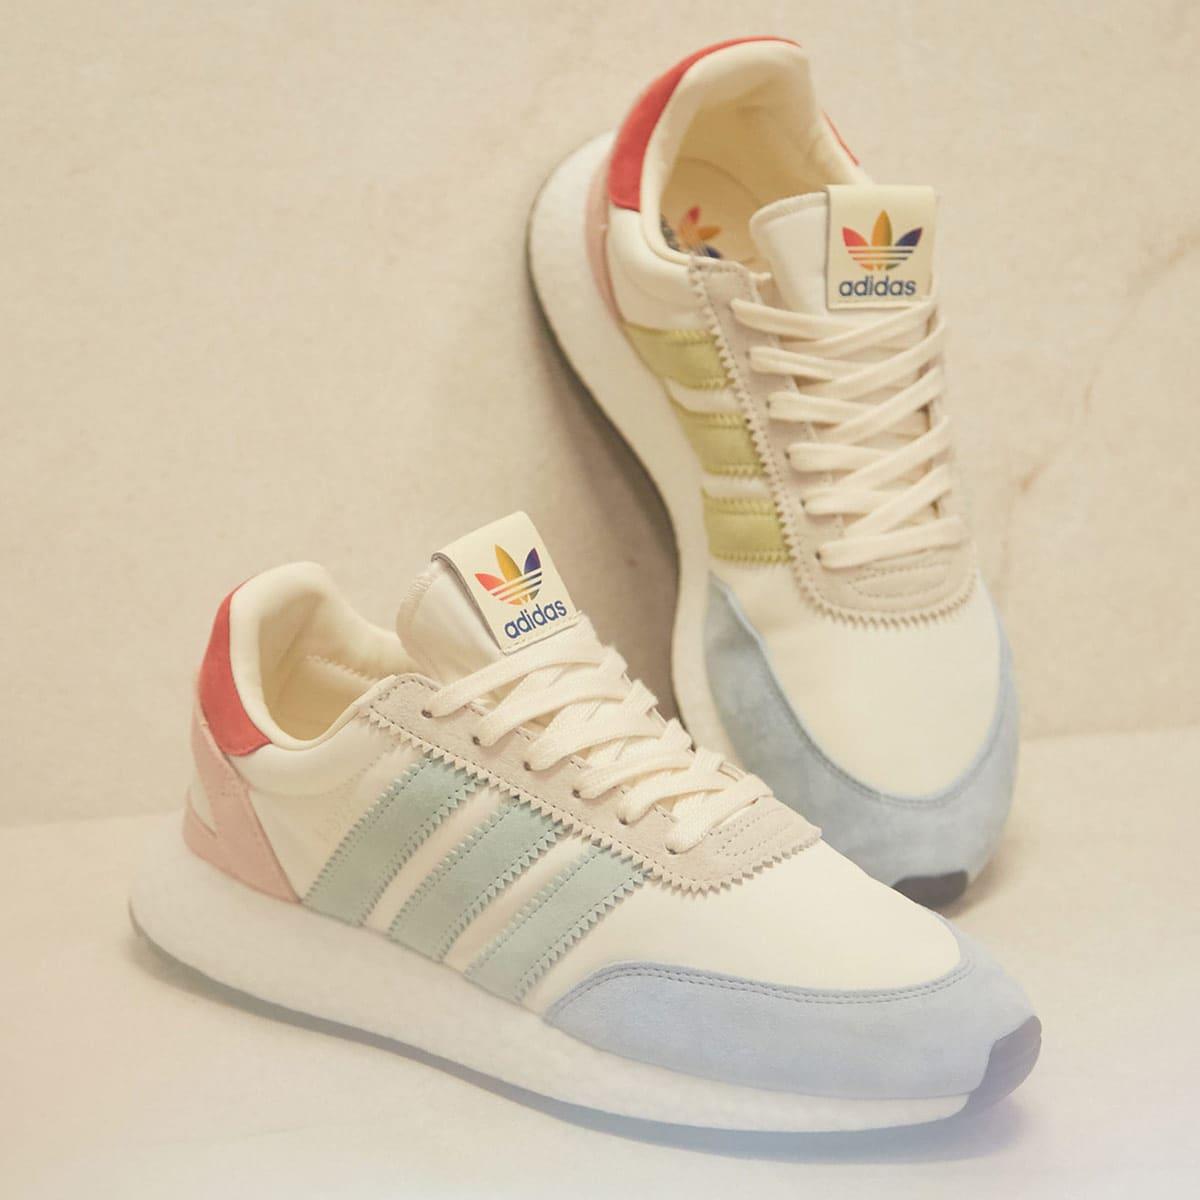 Adidas I 5923 Runner Pride Cream White Black | What We